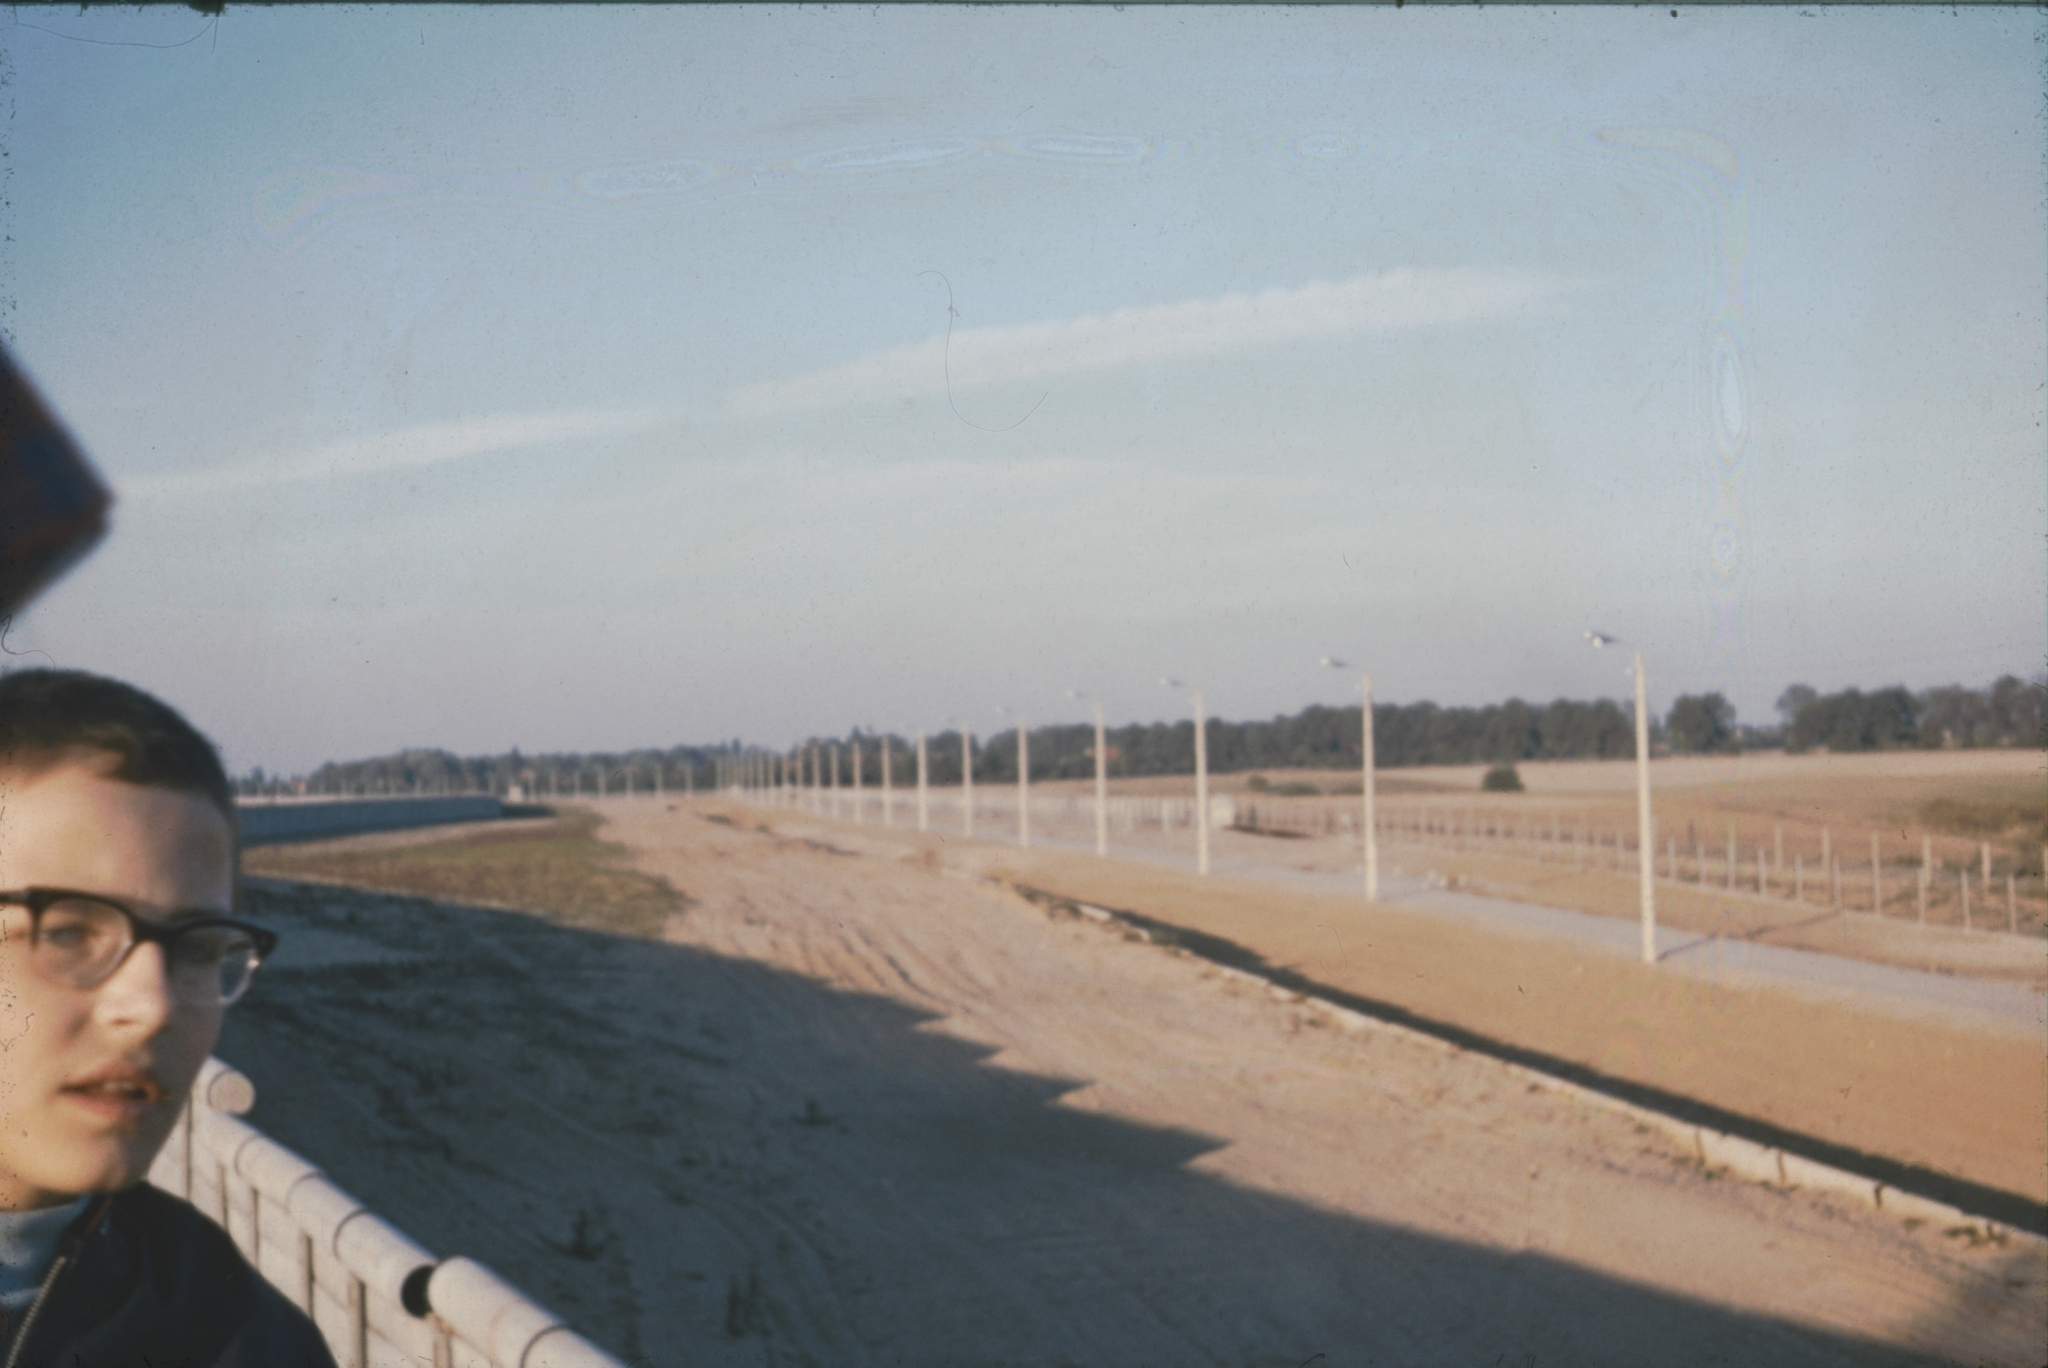 Die Berliner Mauer um 1973 - Berlin Wall - Daniel Rohde-Kage 57